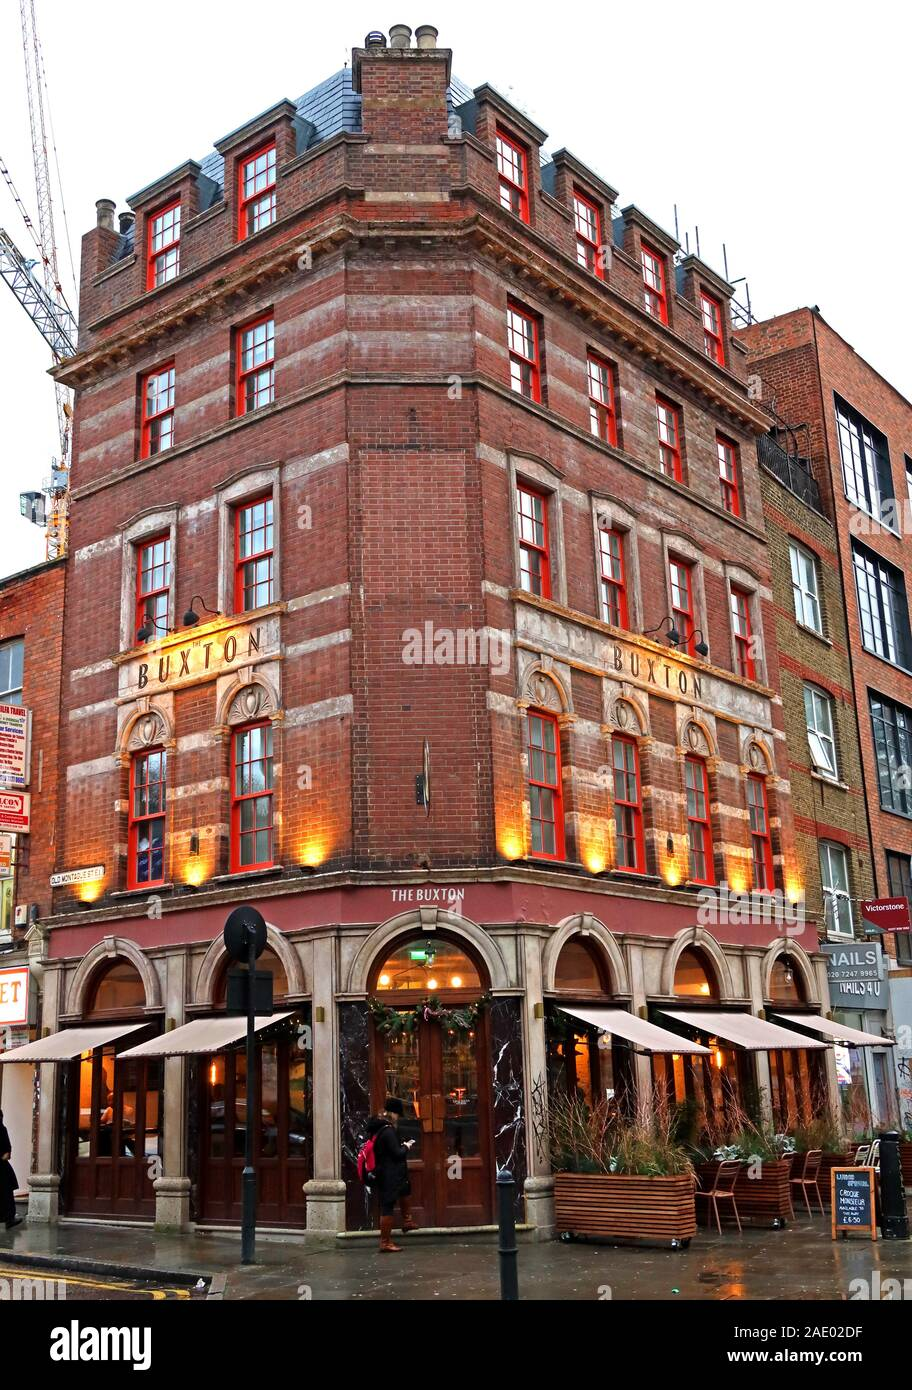 Dieses Stockfoto: The Buxton Pub and Hotel, Brick Lane, 42 Osborn Street, London E1 6TD - 2AE02D